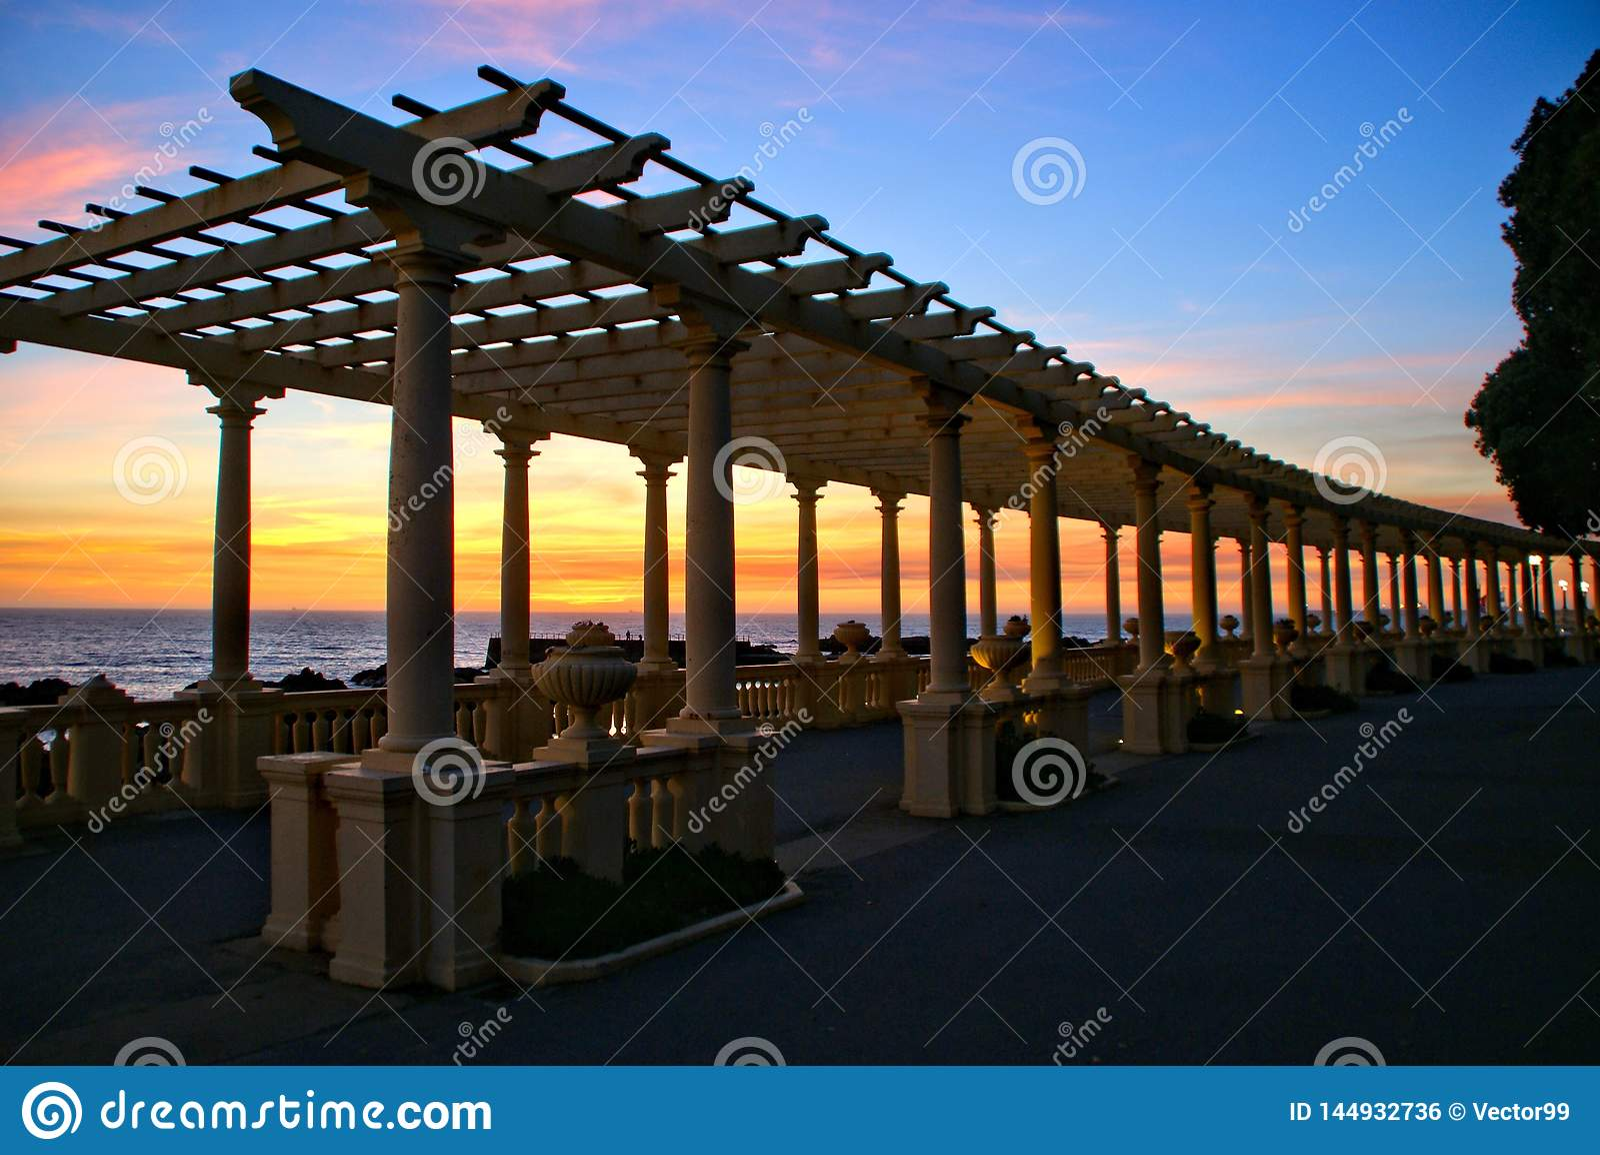 Coastal way sunset with Pergola at Foz do Douro